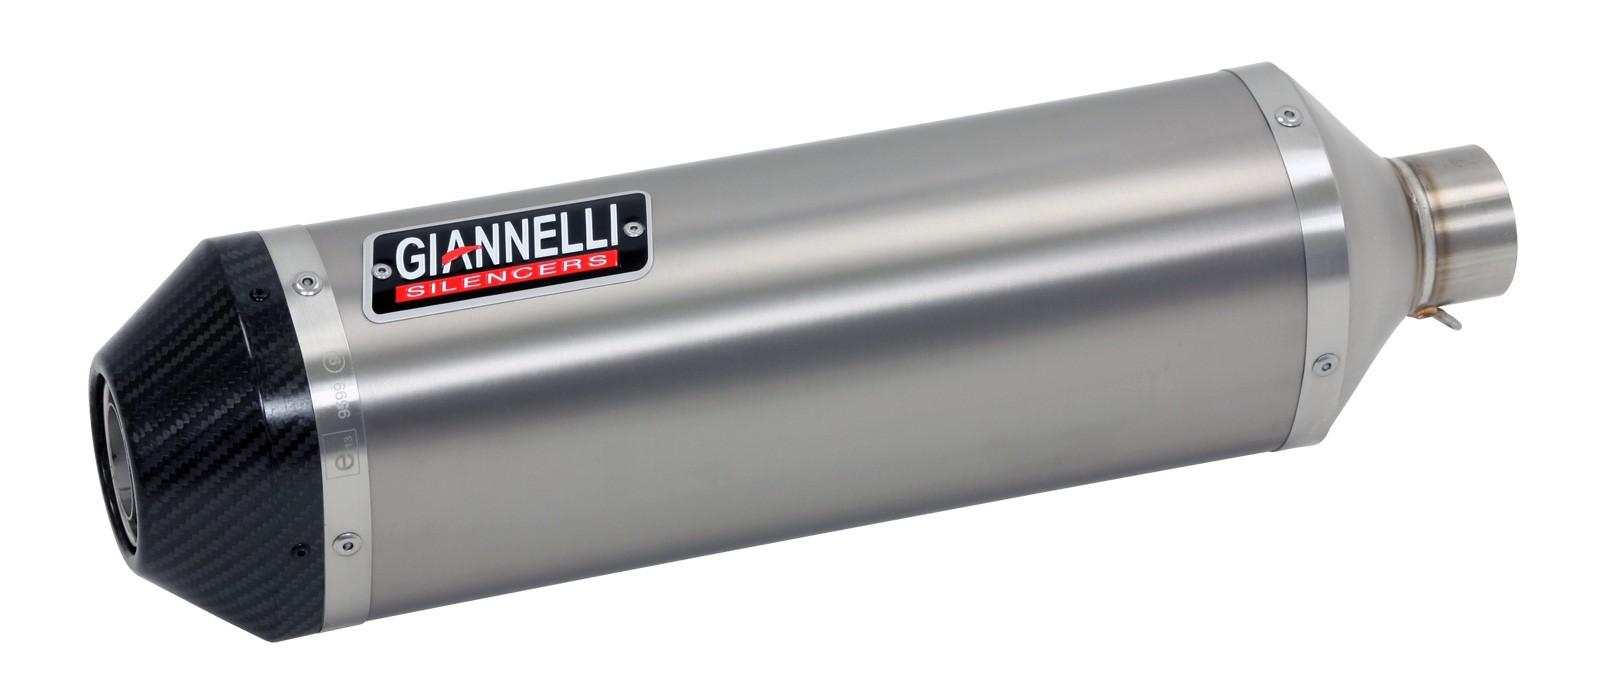 ESCAPES GIANNELLI KAWASAKI - Slip on IPERSPORT aluminio Kawasaki NINJA 250/300 Giannelli 73798A6 -